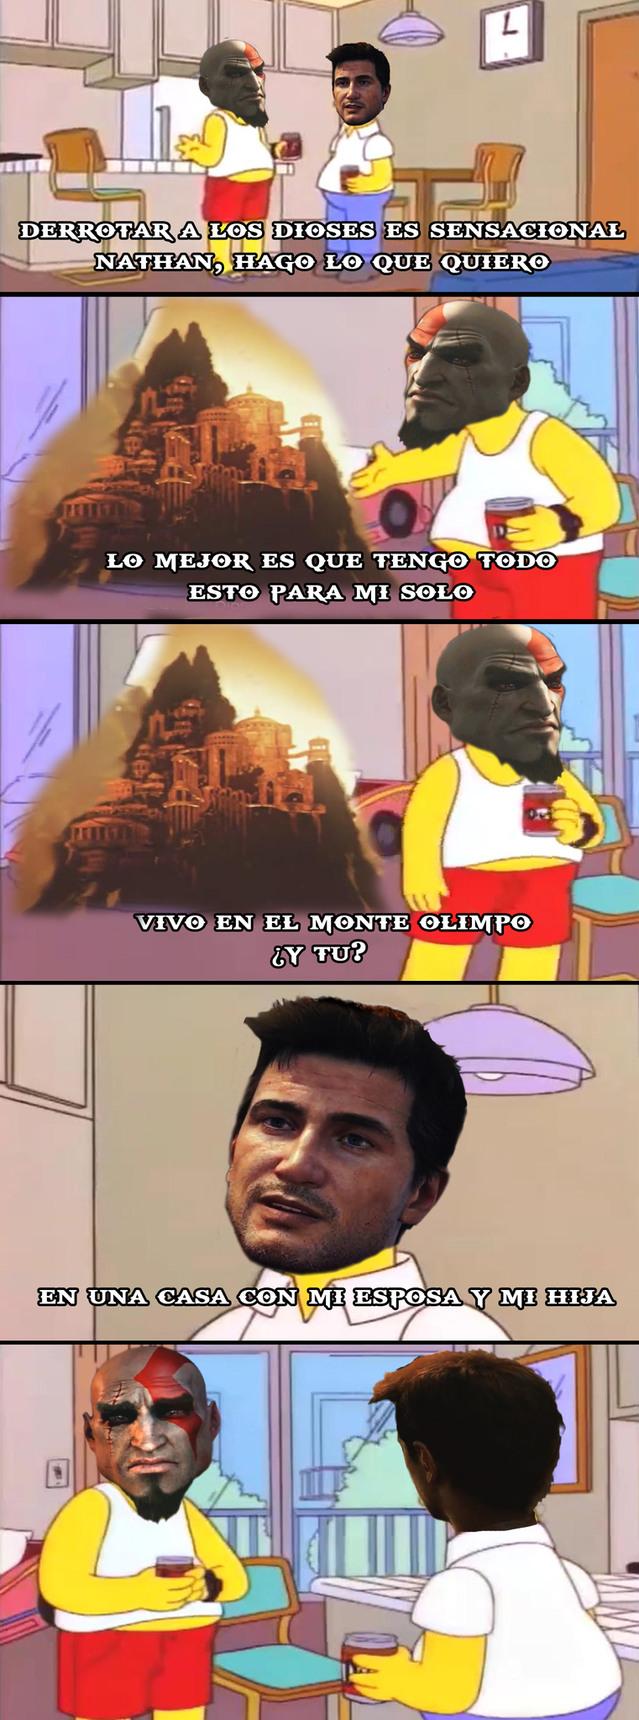 ese kratos - meme